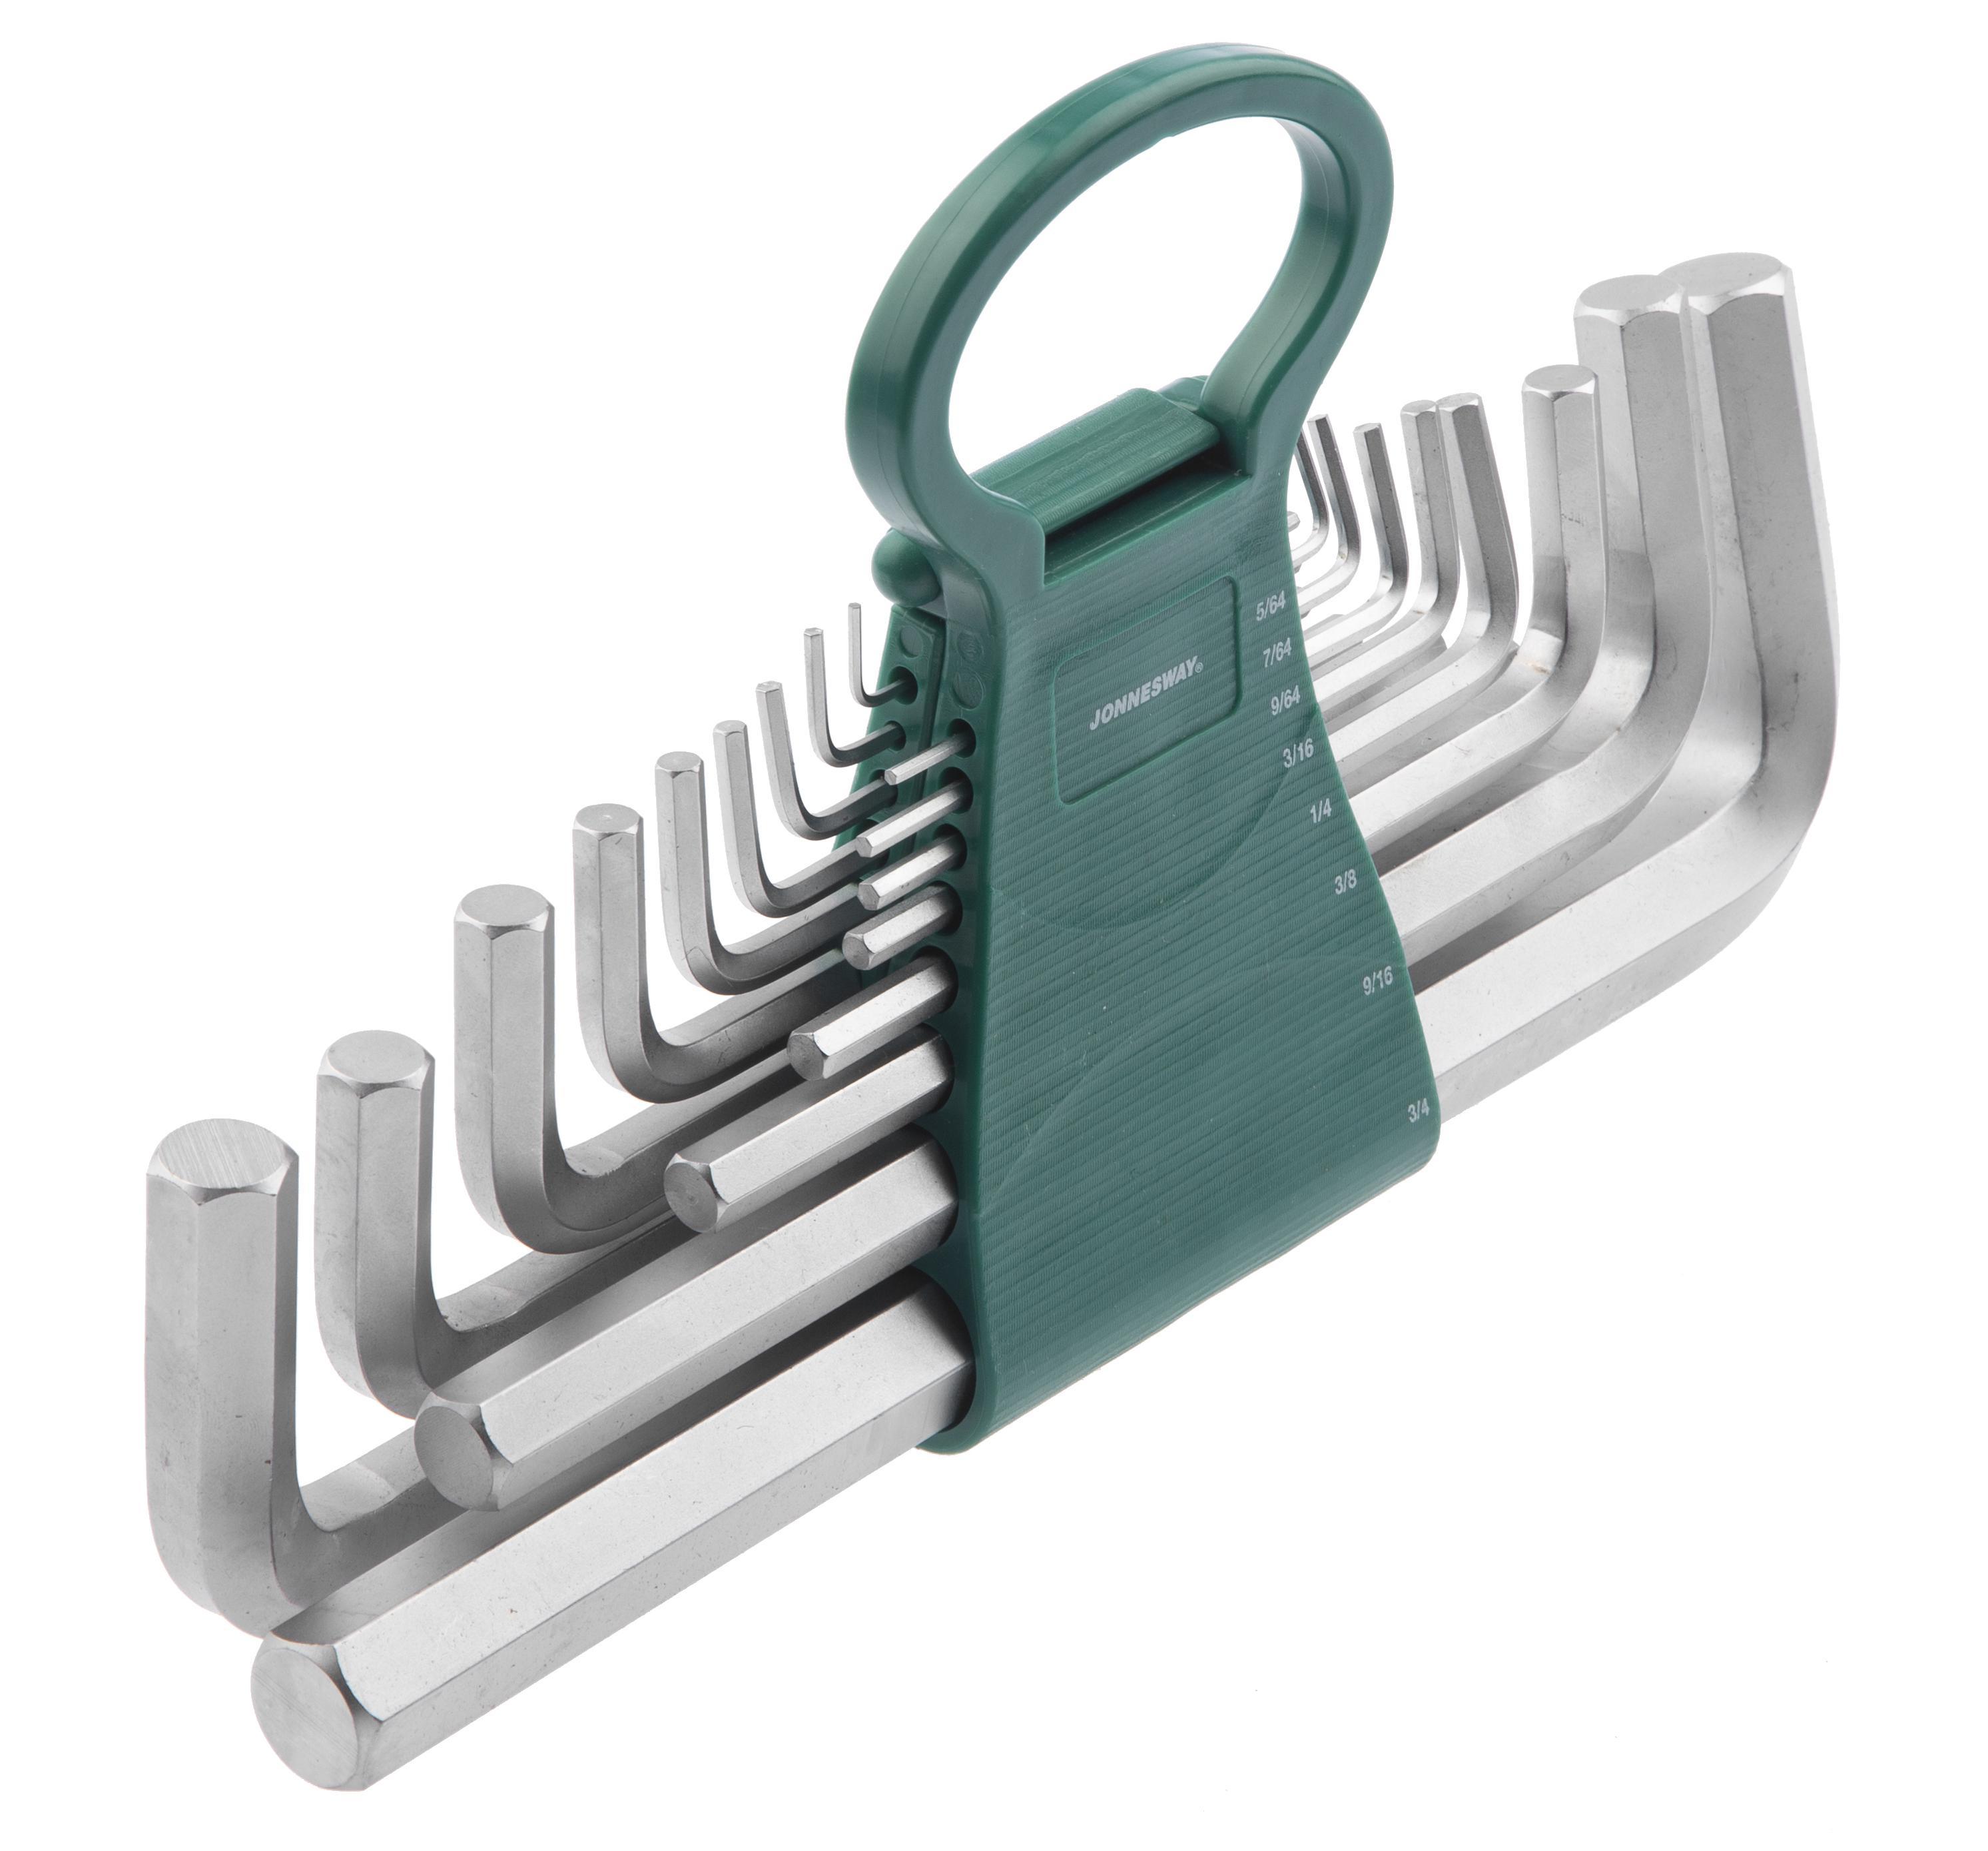 Набор шестигранных ключей Jonnesway H02mh217s набор jonnesway ai050004